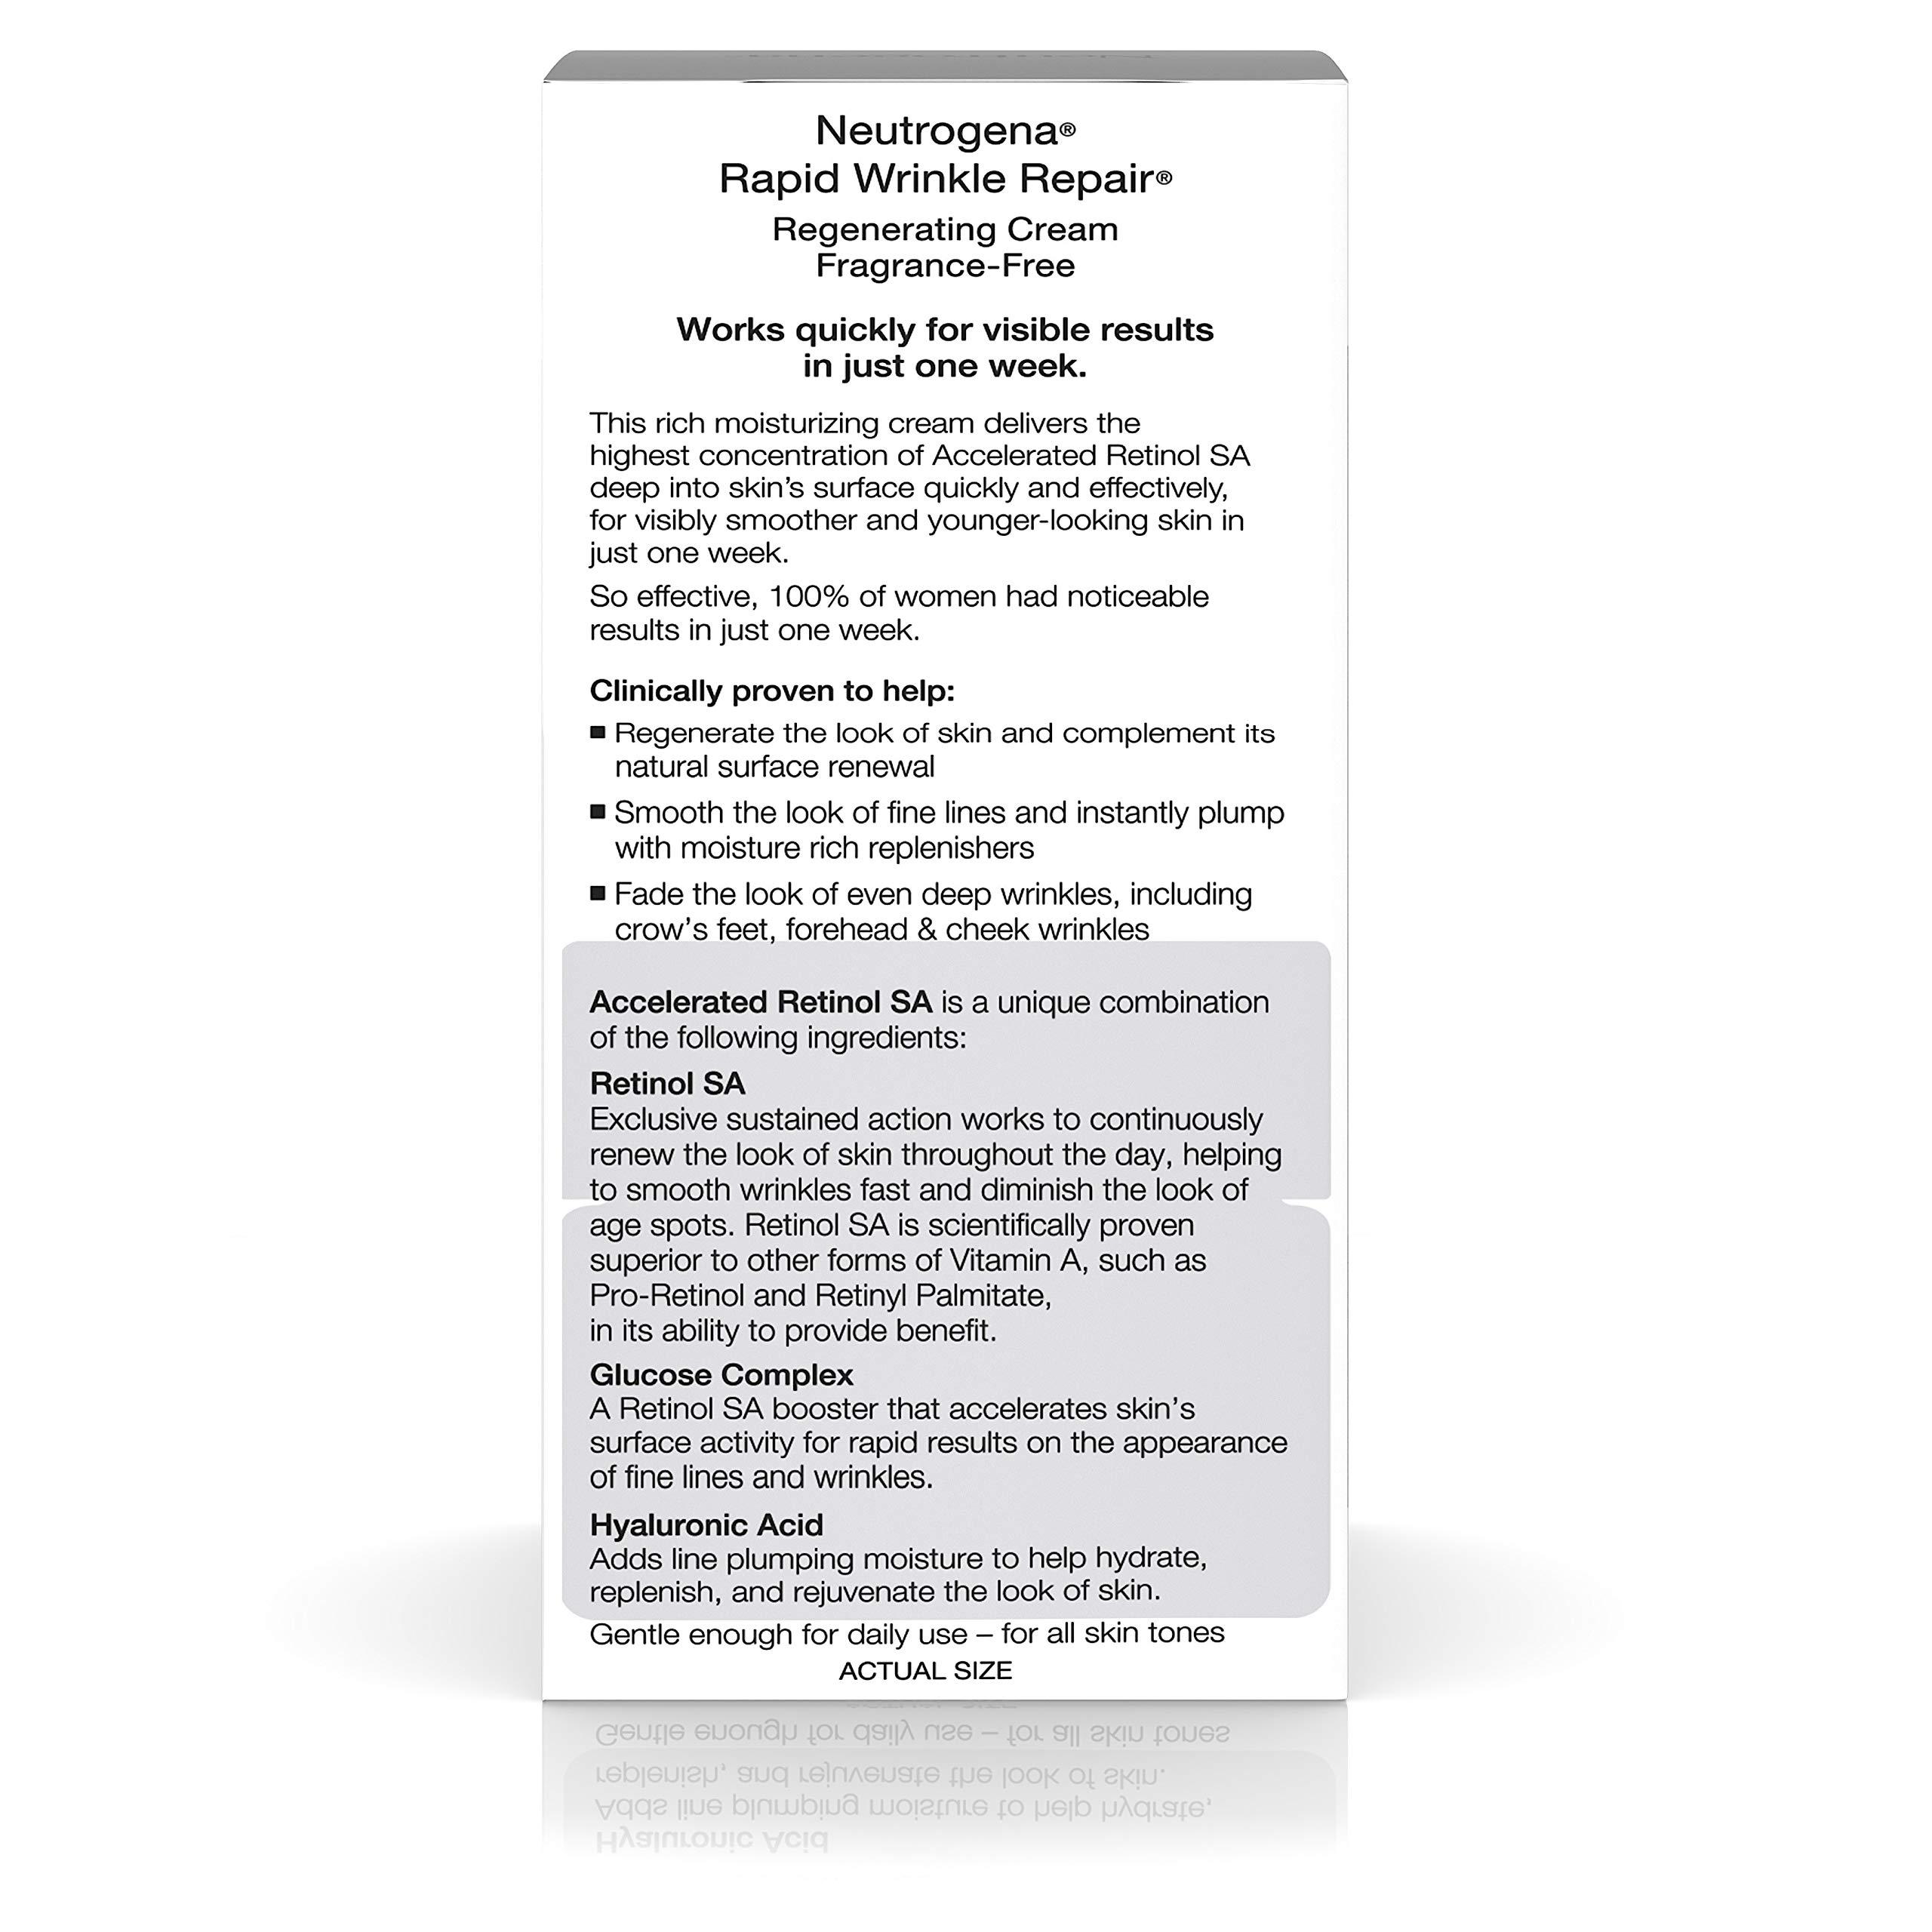 Neutrogena Rapid Wrinkle Repair Hyaluronic Acid Retinol Cream, Anti Wrinkle Cream, Face Moisturizer, Neck Cream & Dark Spot Remover for Face - Day & Night Cream with Hyaluronic Acid & Retinol, 1.7 oz by Neutrogena (Image #2)